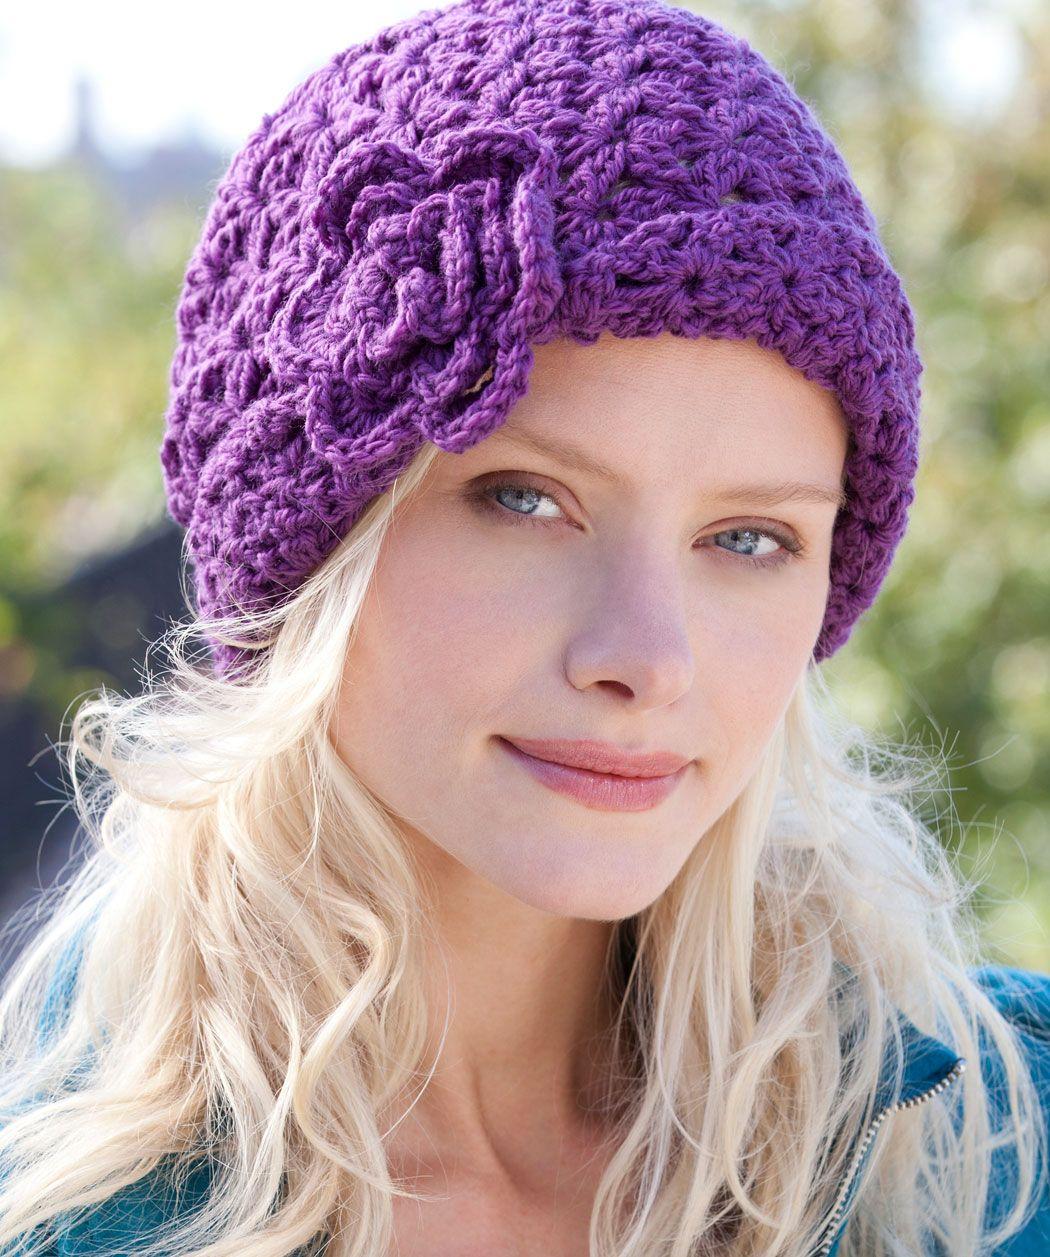 Top 10 diy crocheted hats free crochet hat patterns crochet and free crochet hat patterns easy crocheted hat patterns free bankloansurffo Image collections